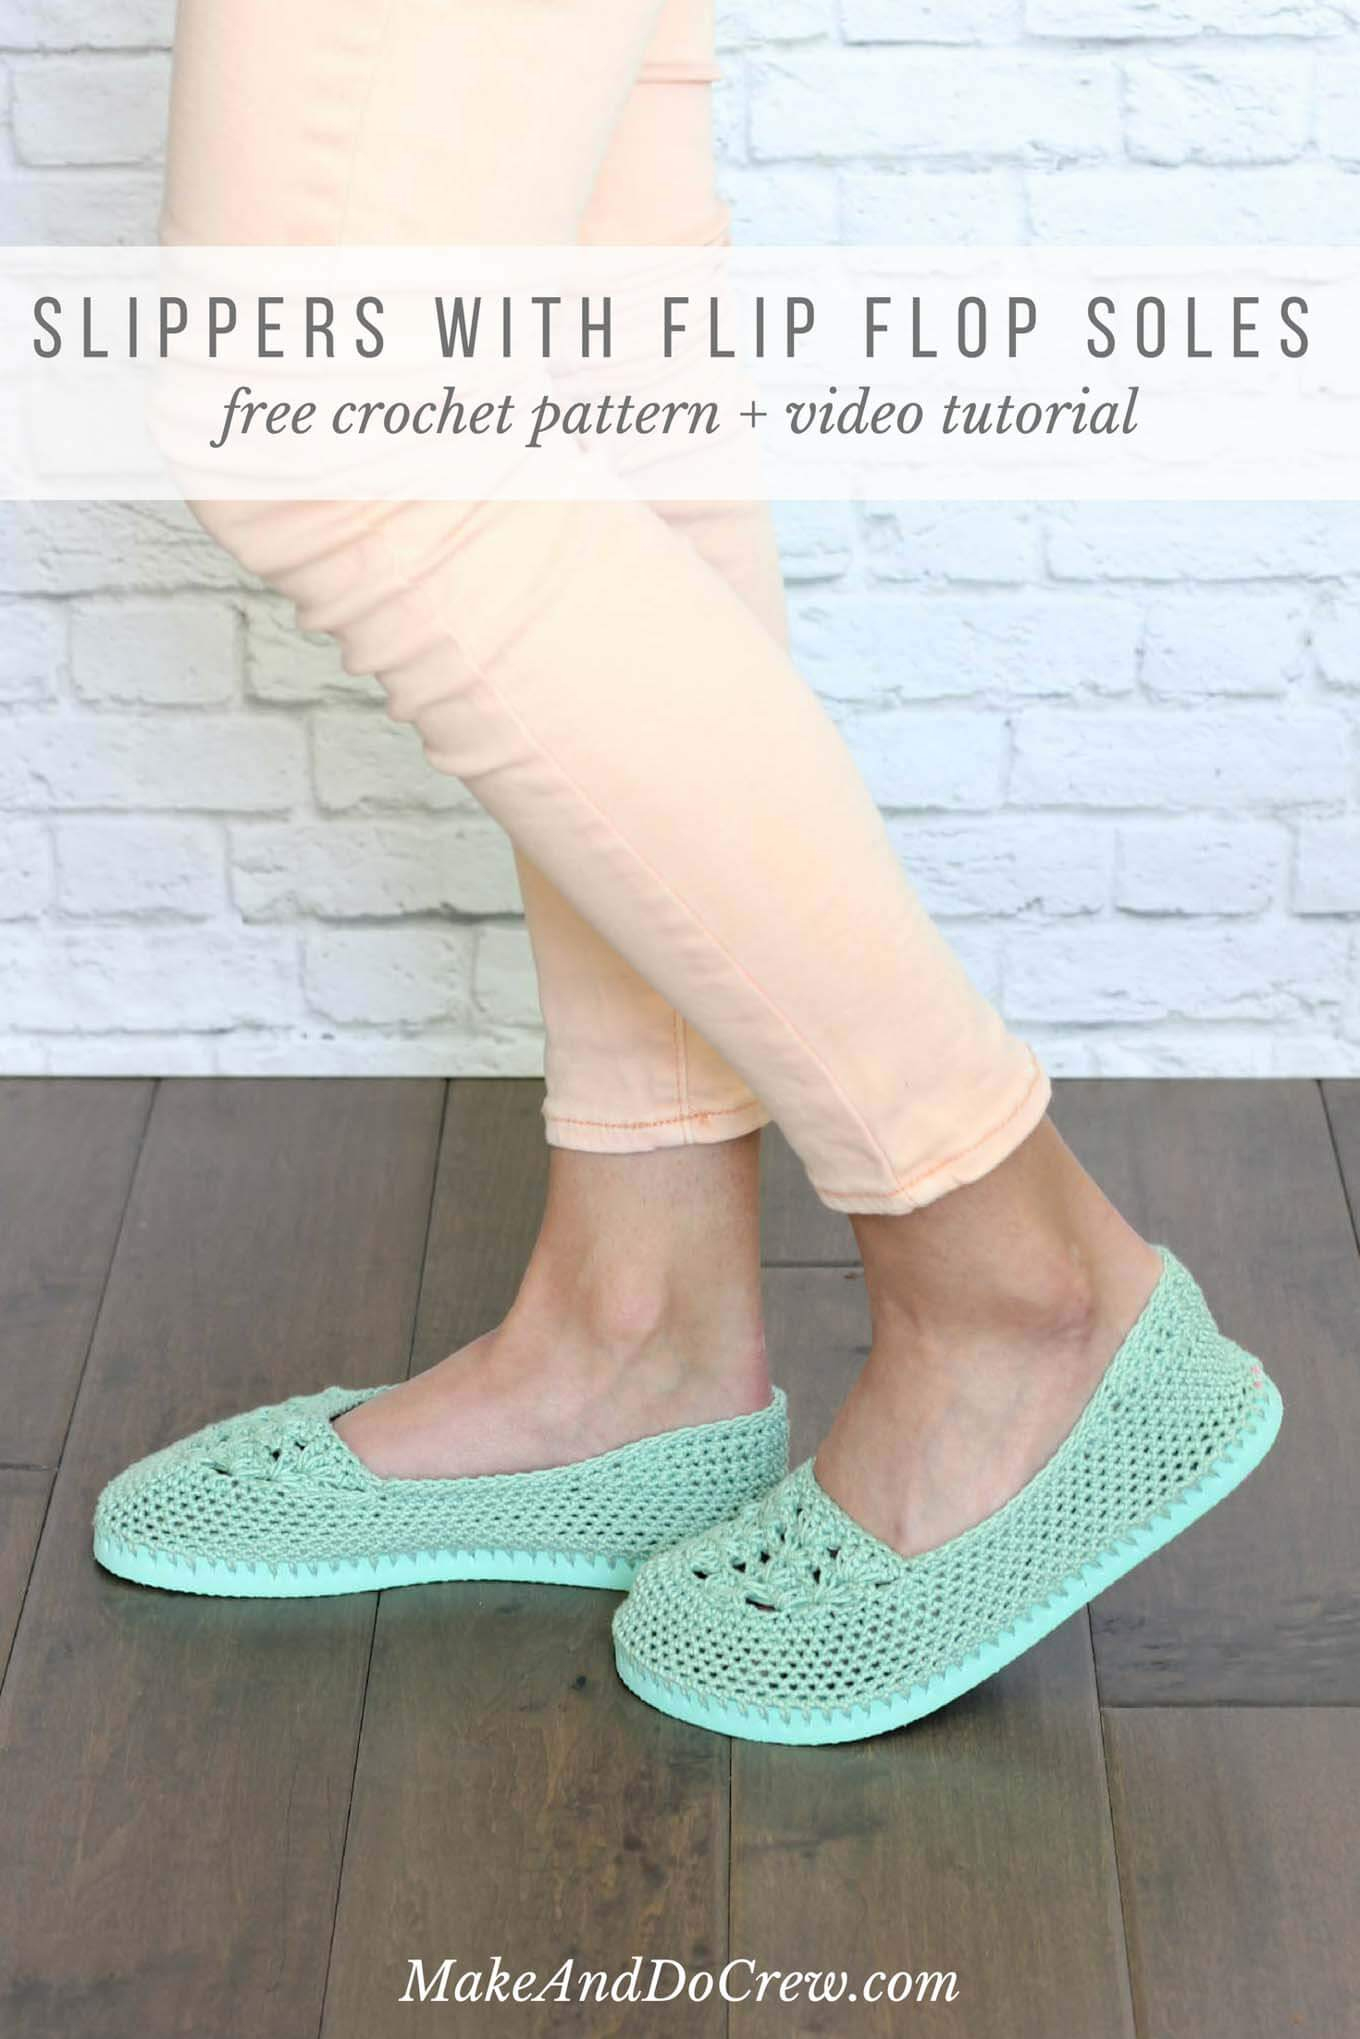 Crochet Slippers With Flip Flop Soles -- Free Pattern + Video Tutorial! - Free Printable Flip Flop Pattern